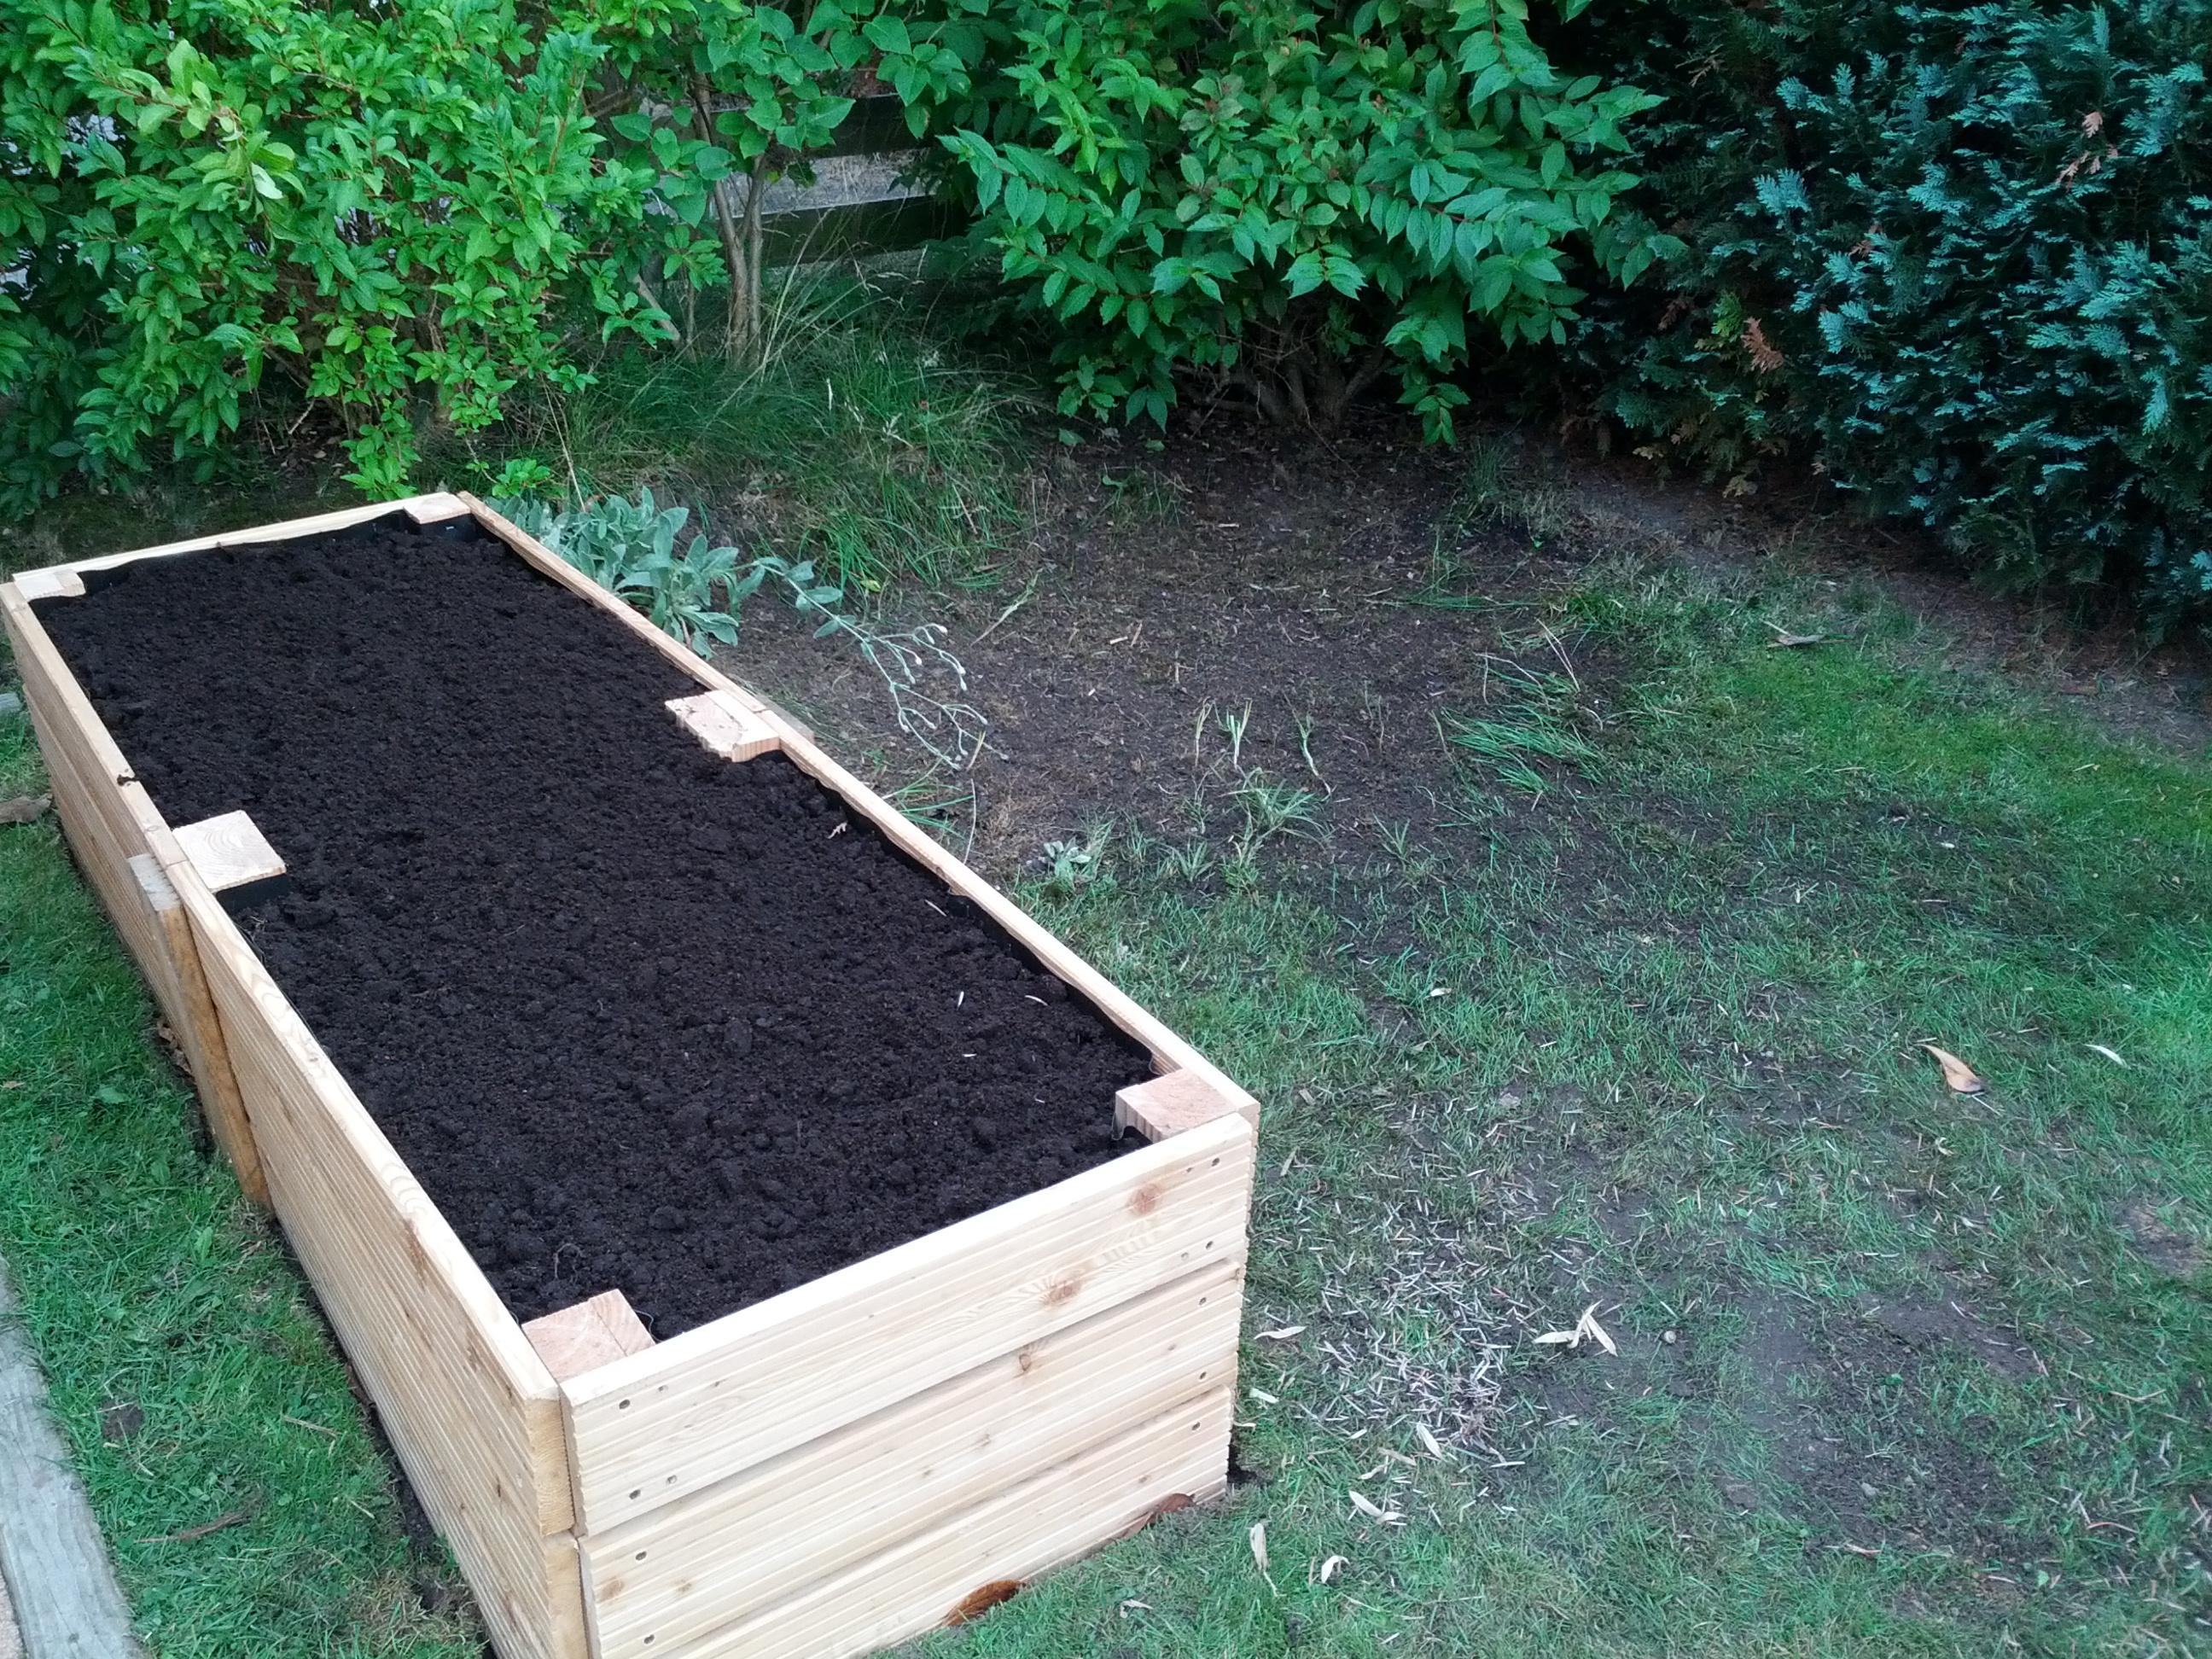 hochbeet bepflanzen september interessante. Black Bedroom Furniture Sets. Home Design Ideas